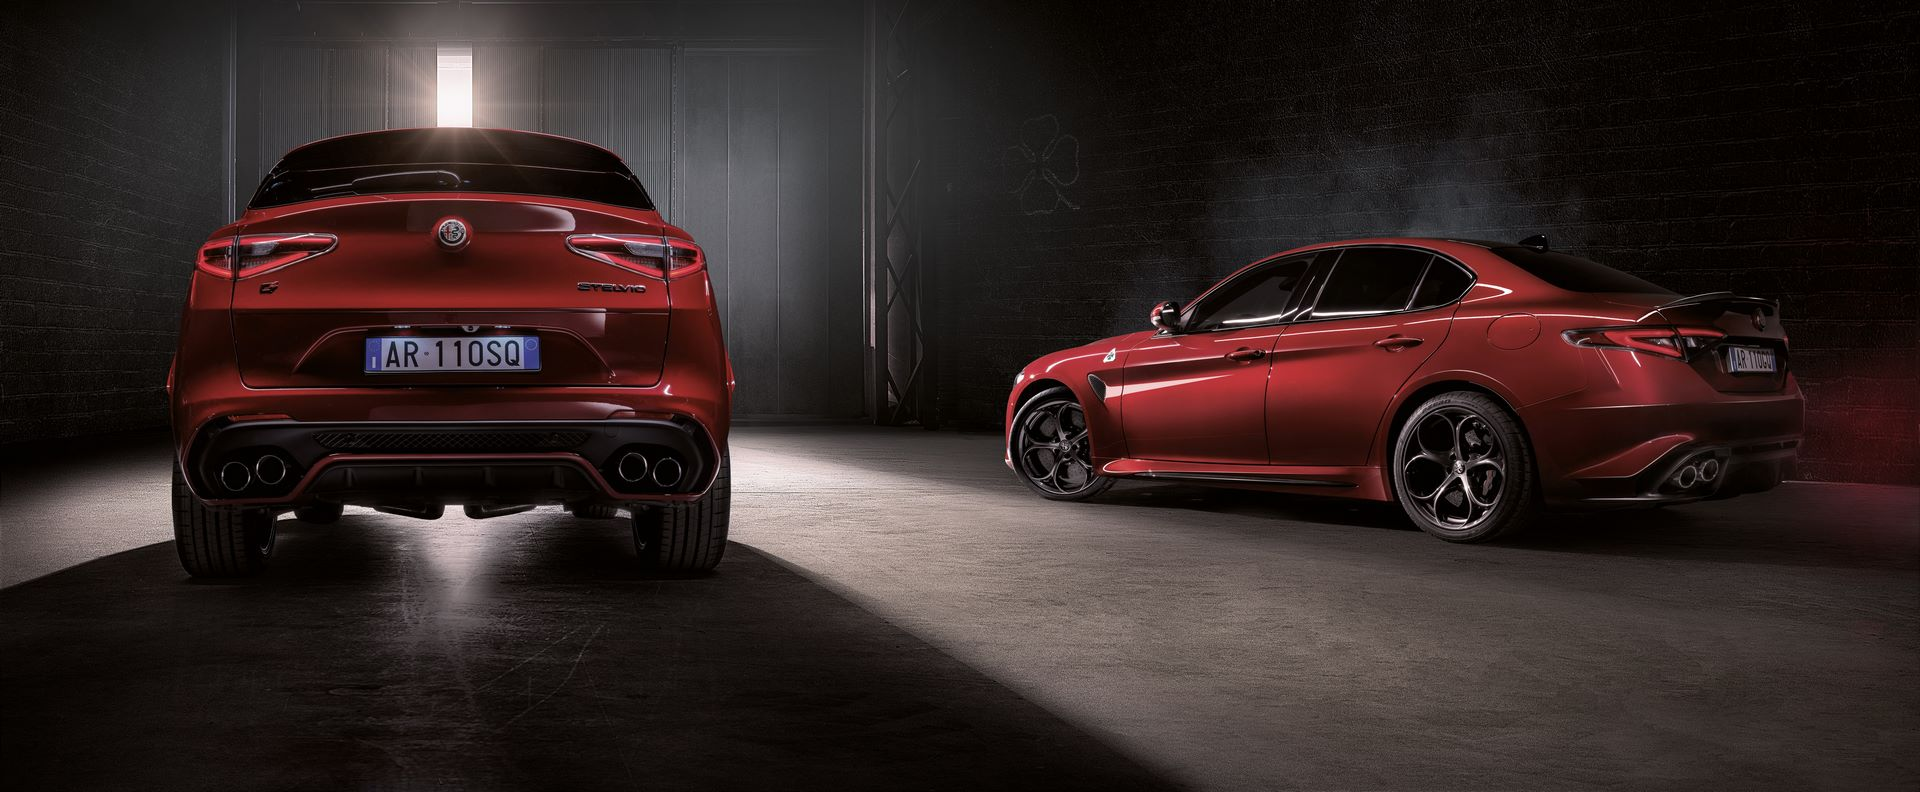 Alfa-Romeo-Giulia-Quadrifoglio-Stelvio-Quadrifoglio-facelift-2020-11